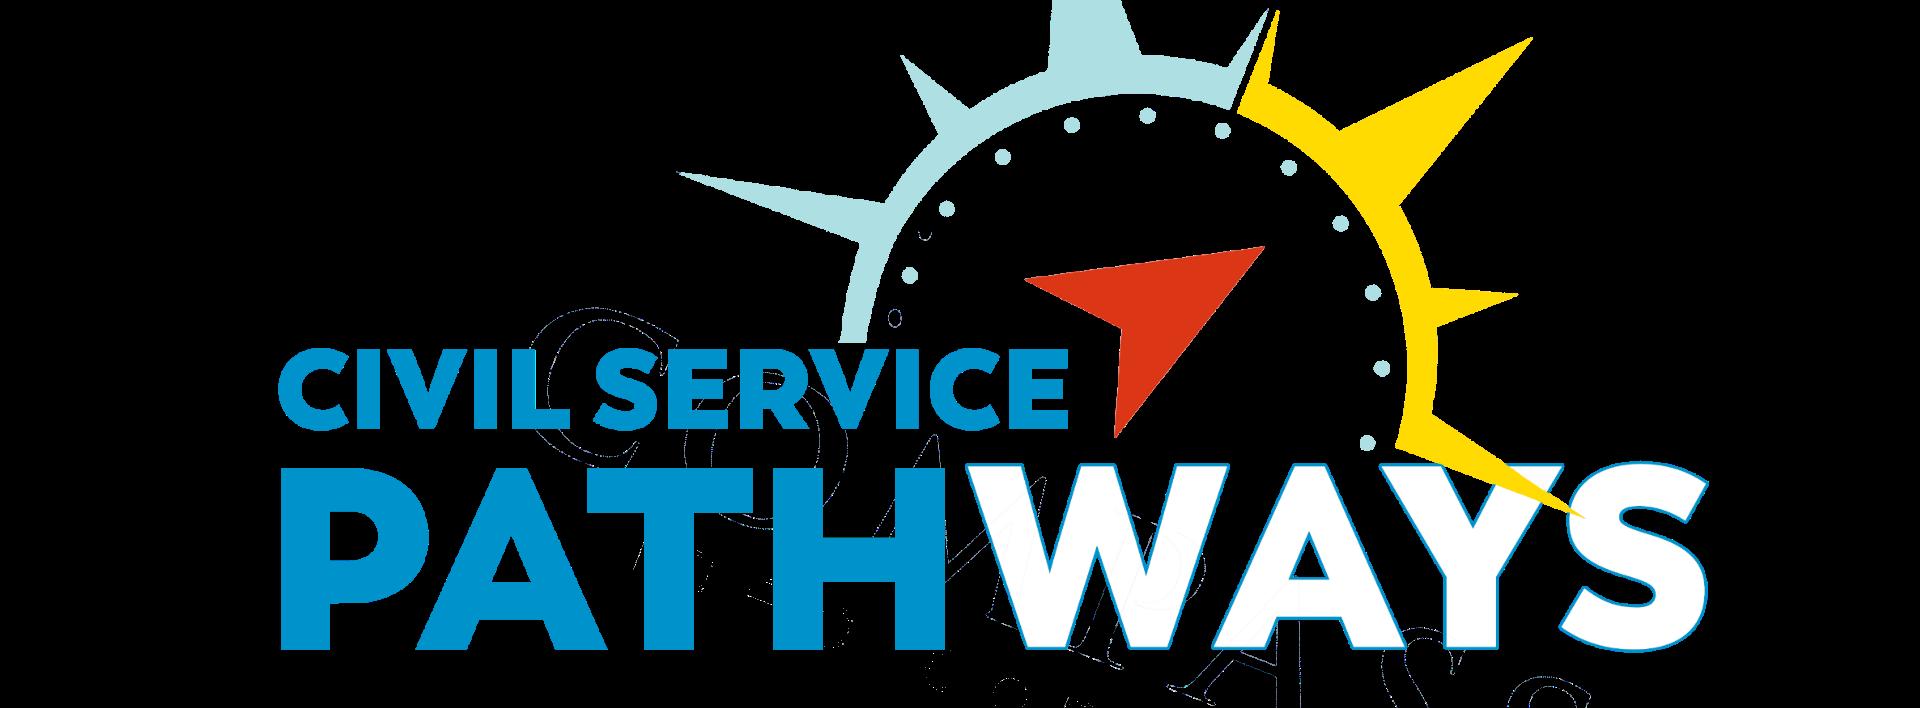 CIVIL SERVICE PATHWAYS logo